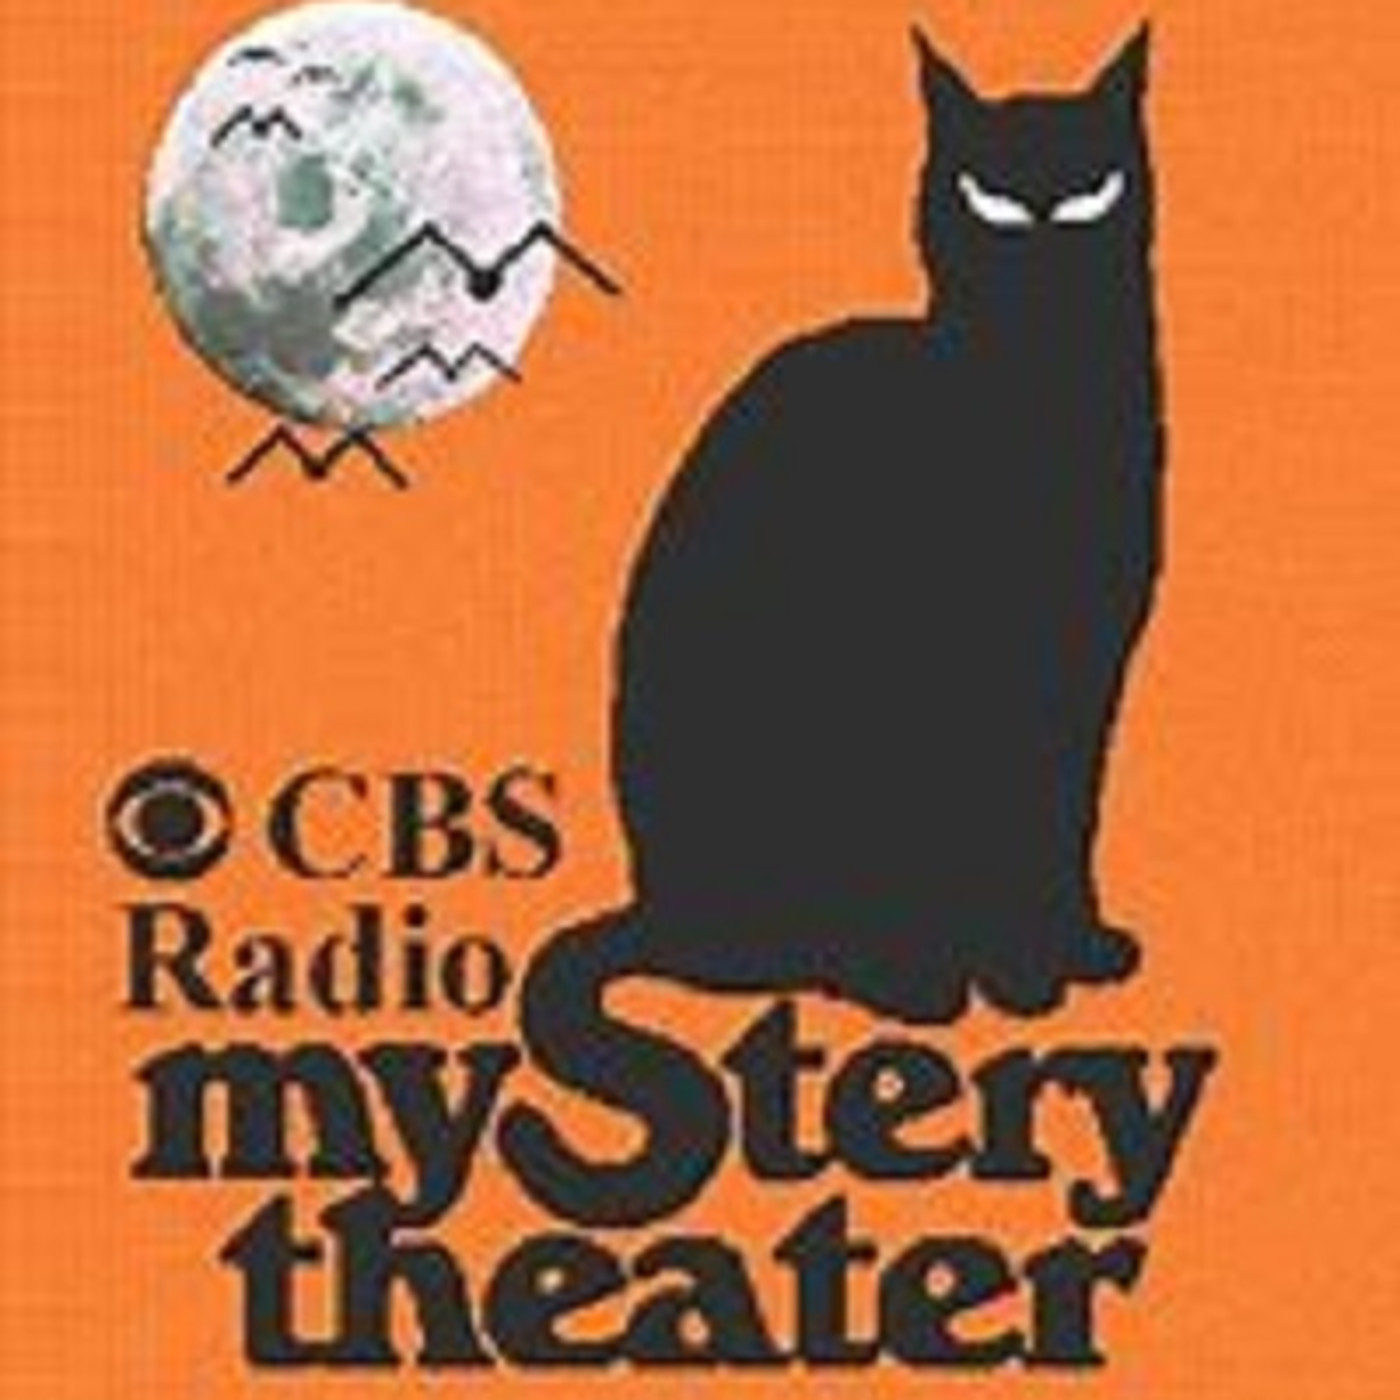 CBS Radio Mystery Theater_79-09-17_(1013)_The Guillotine